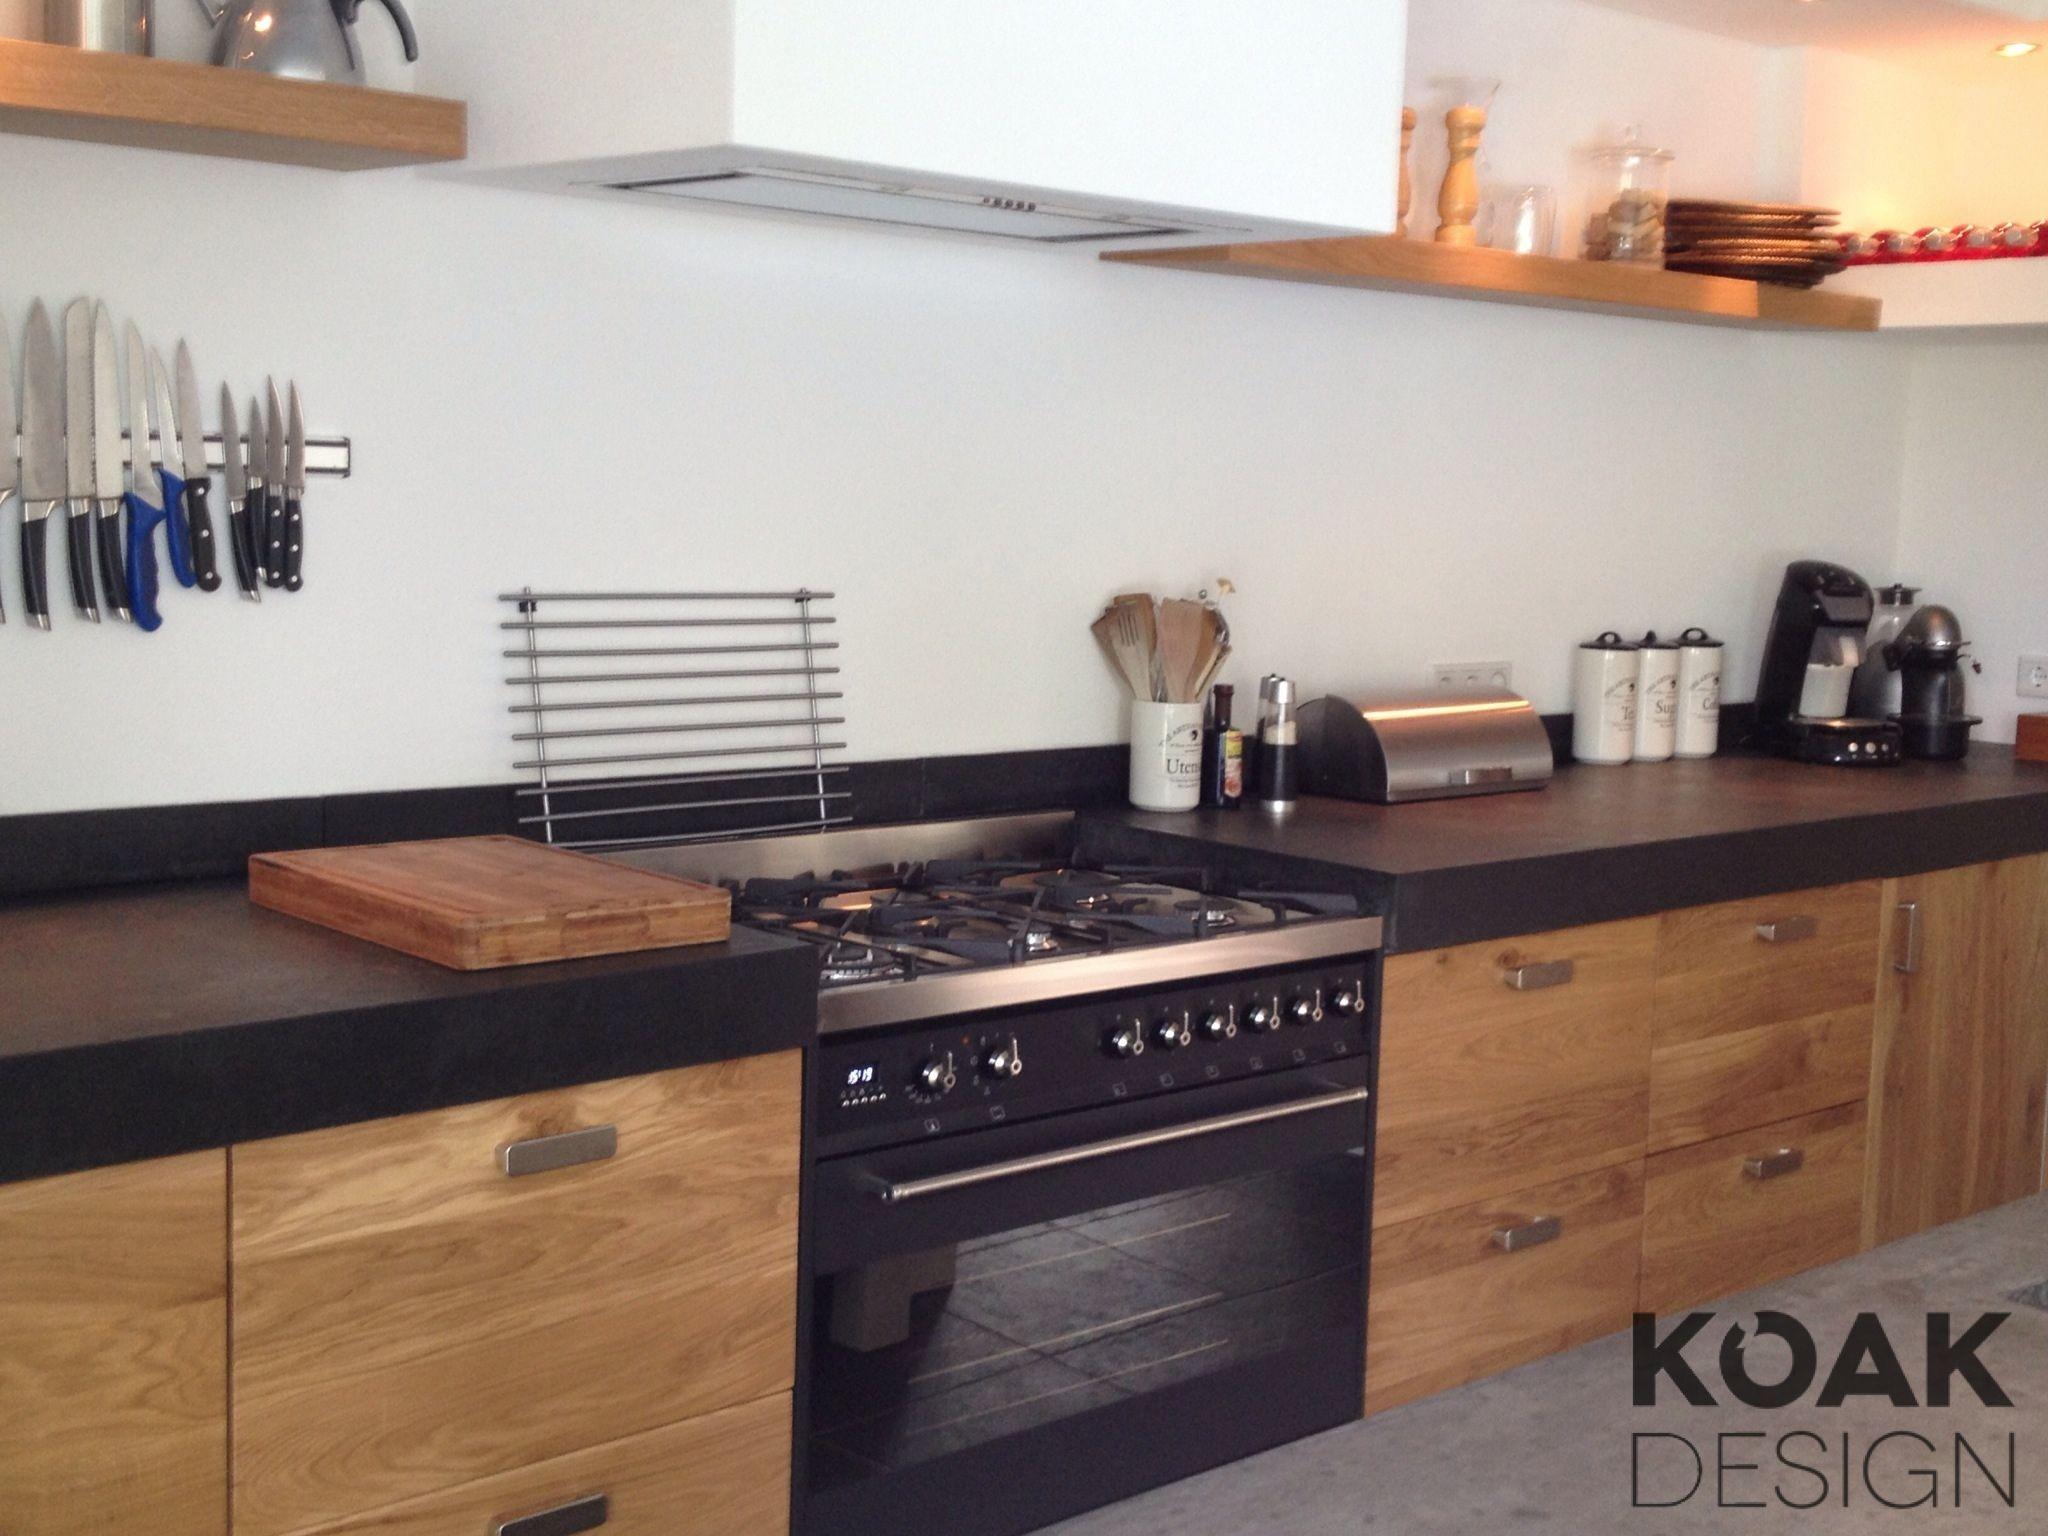 Keuken Eiken Houten : Koak keuken massief eiken houten keuken op basis van ikea laden